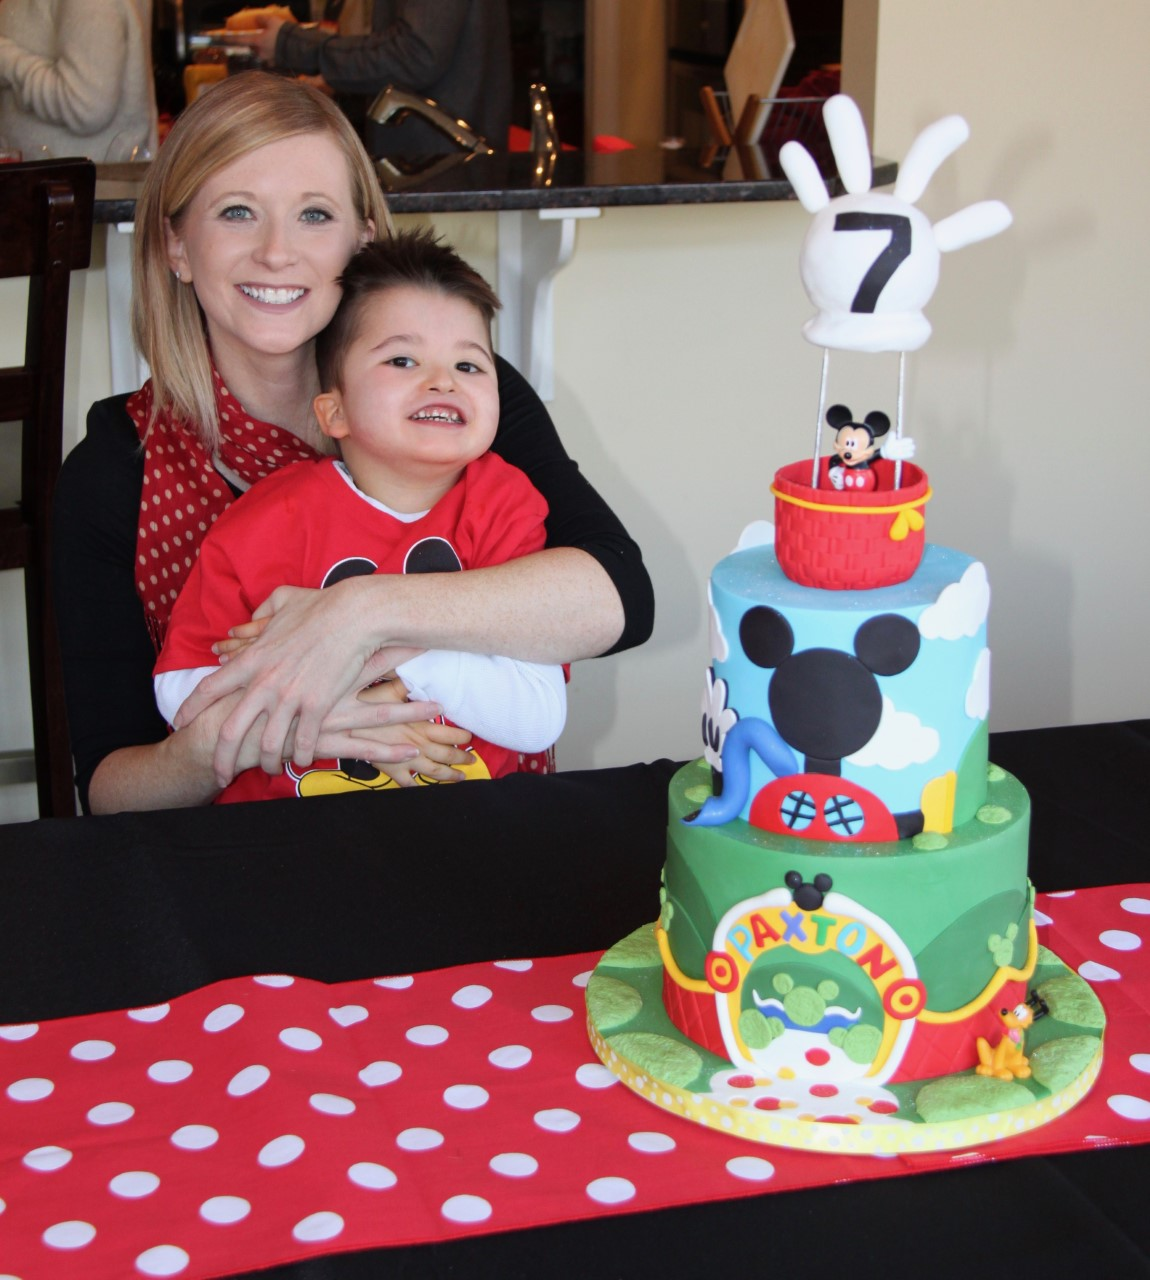 Paxton's Super 7th Birthday